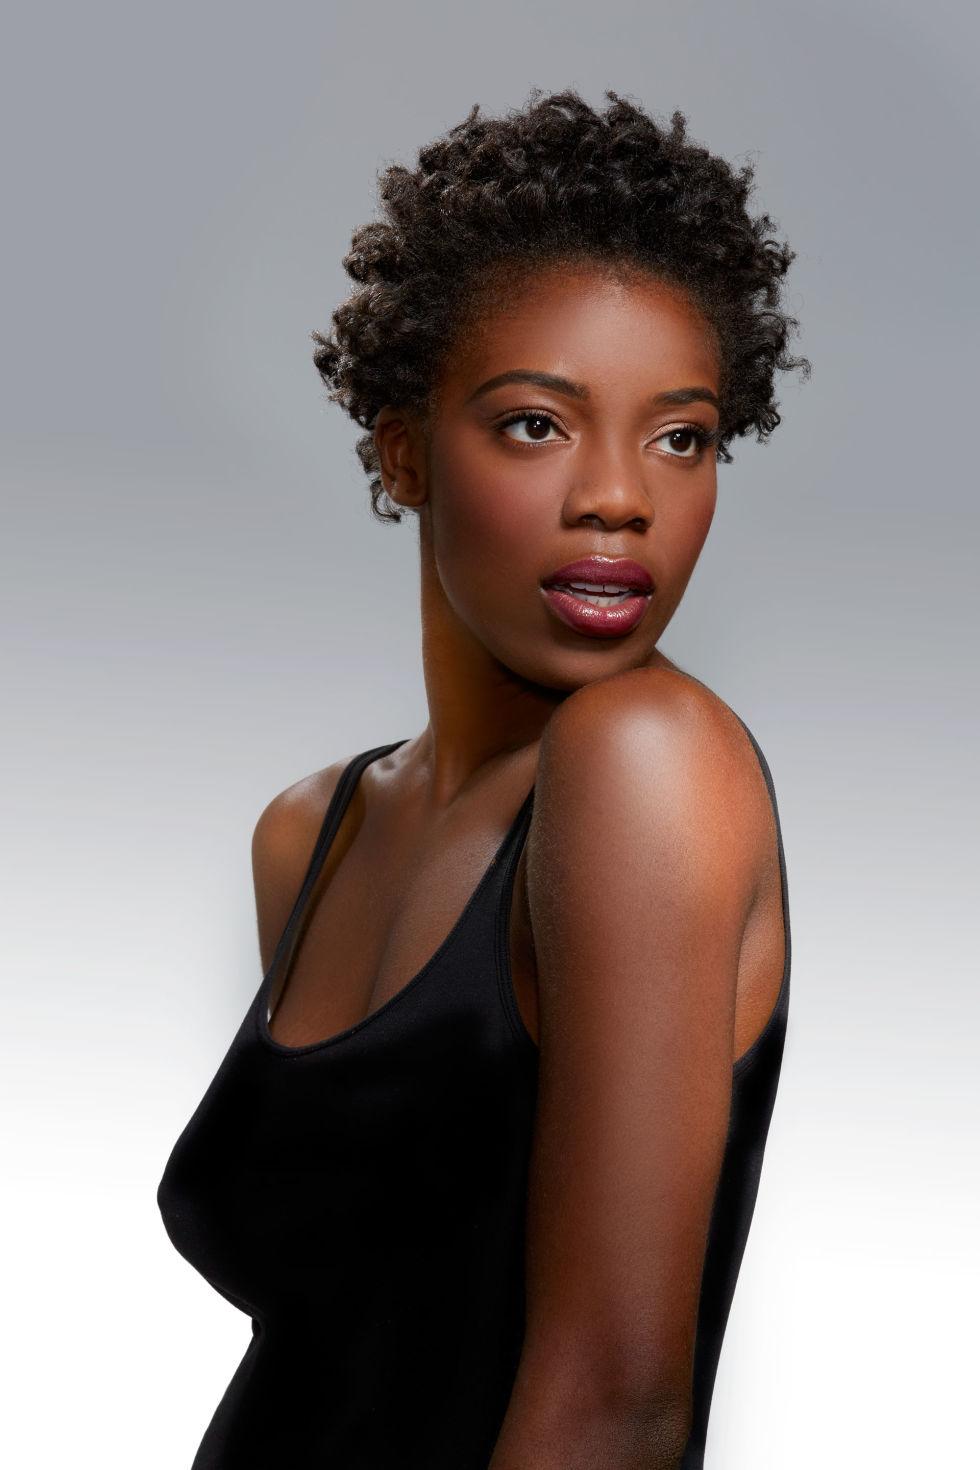 Remarkable 29 Black Hairstyles Best African American Hairstyles Amp Haircuts Short Hairstyles For Black Women Fulllsitofus